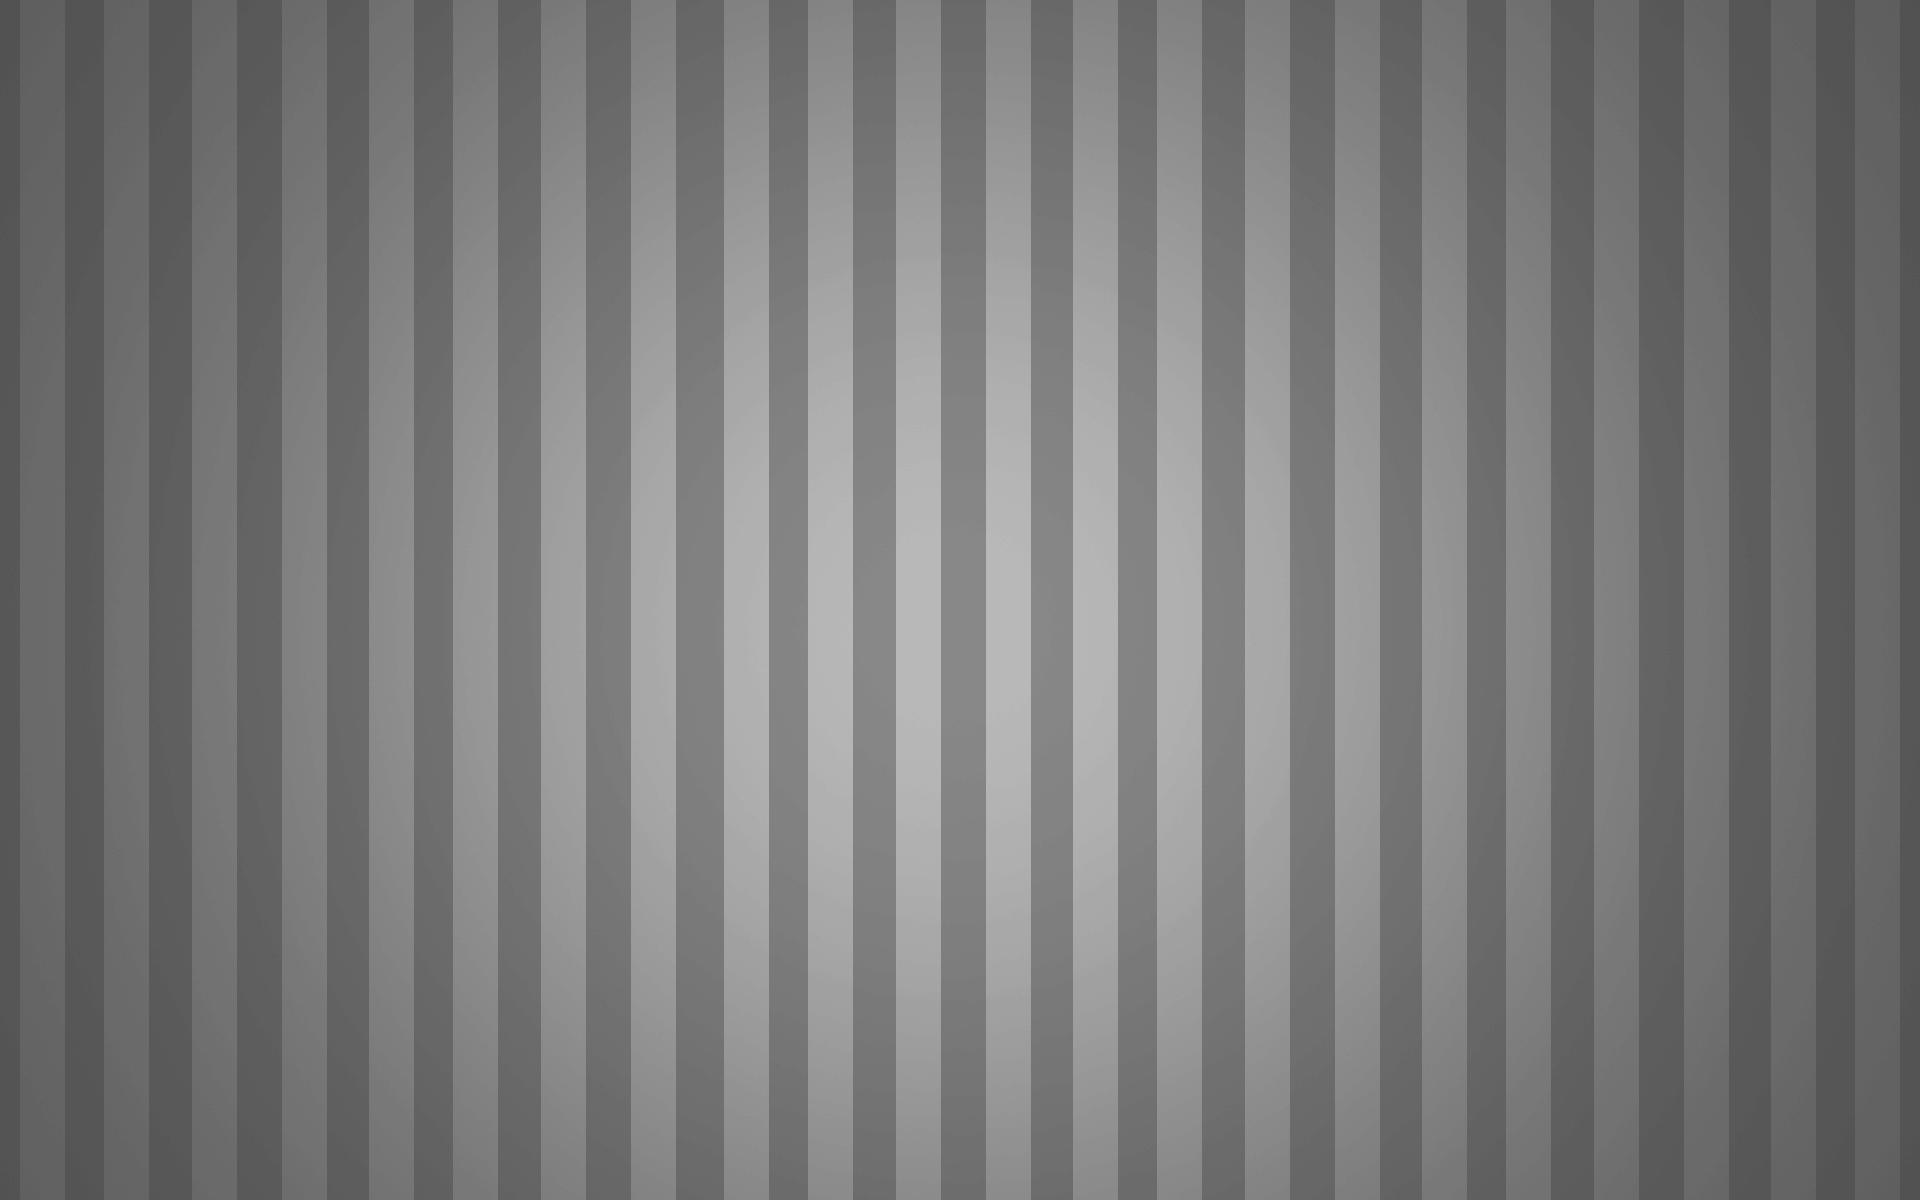 Wallpaper gray stripes 1920x1200 jpg image 1920x1200